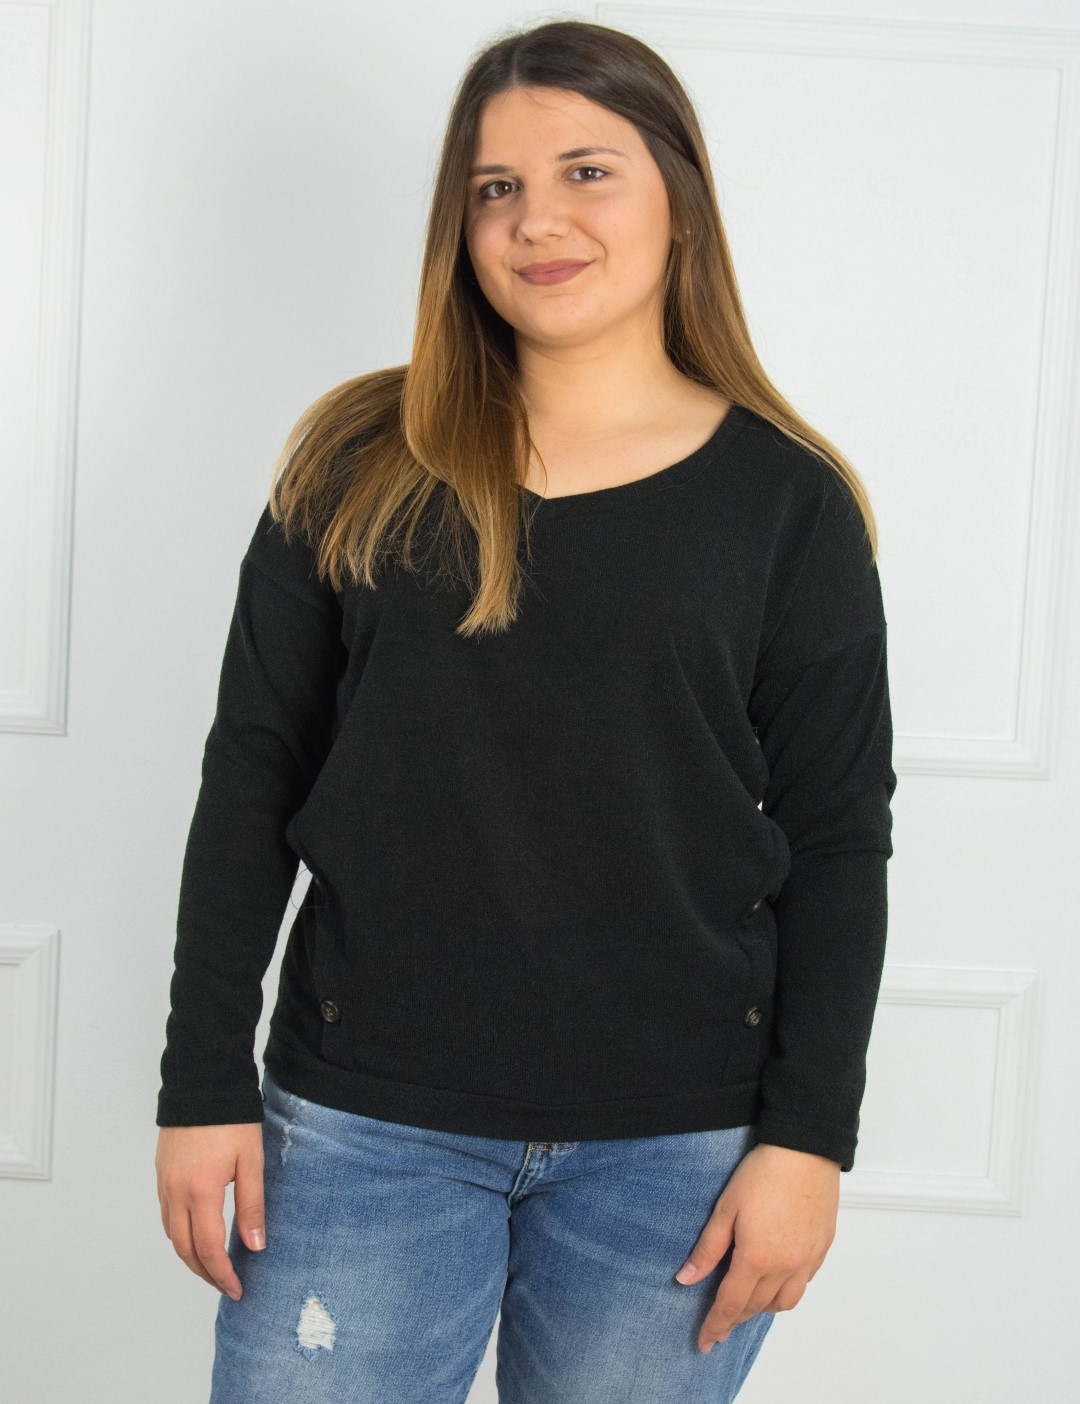 f240d9691803 Γυναικεία μαύρη μακρυμάνικη μπλούζα κουμπιά Honey 39530